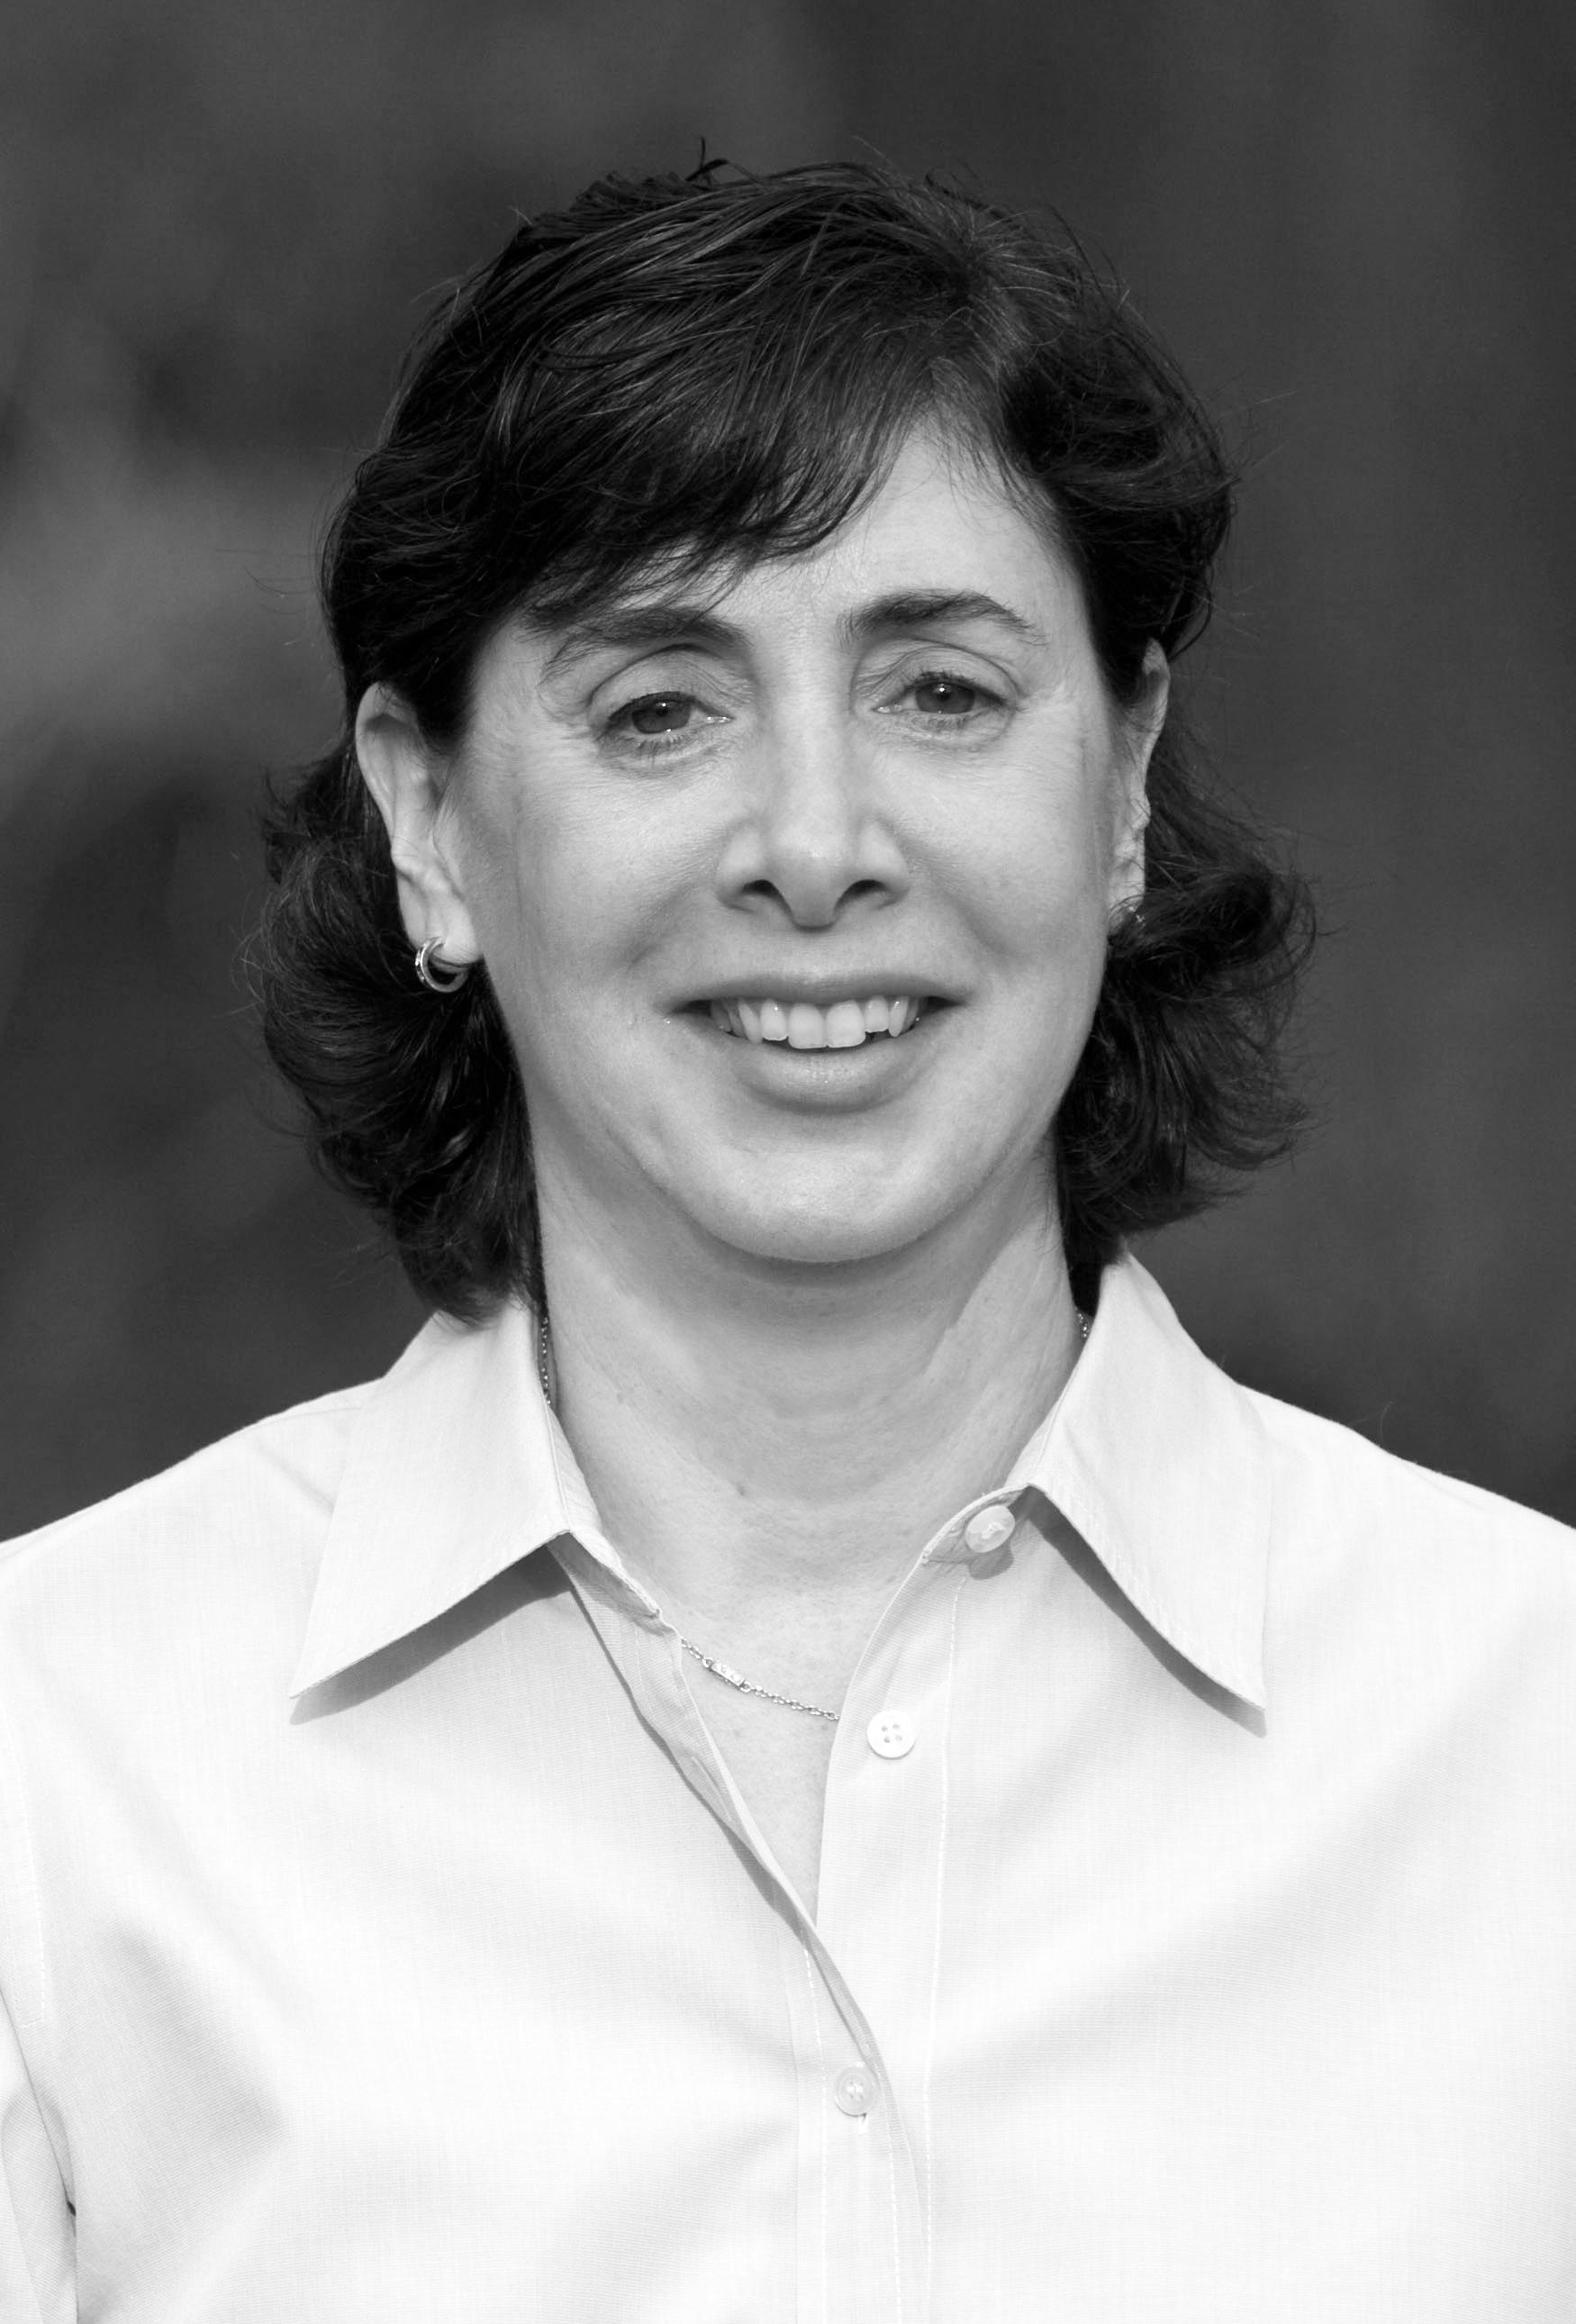 Audrey Winter Kahn